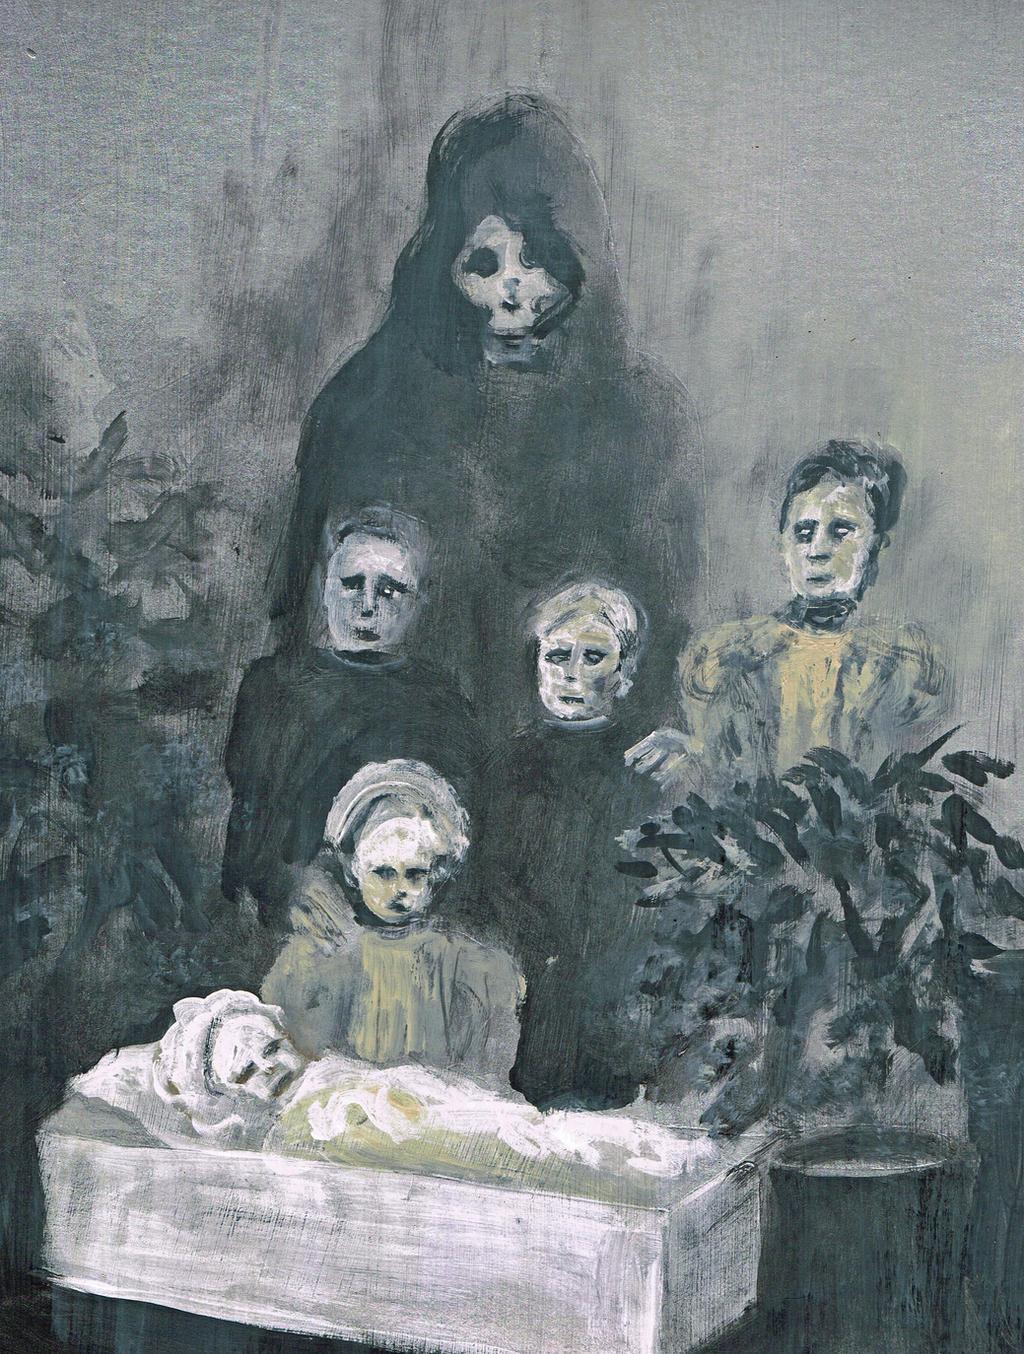 The Shadow of Death by Blackbirdmotel